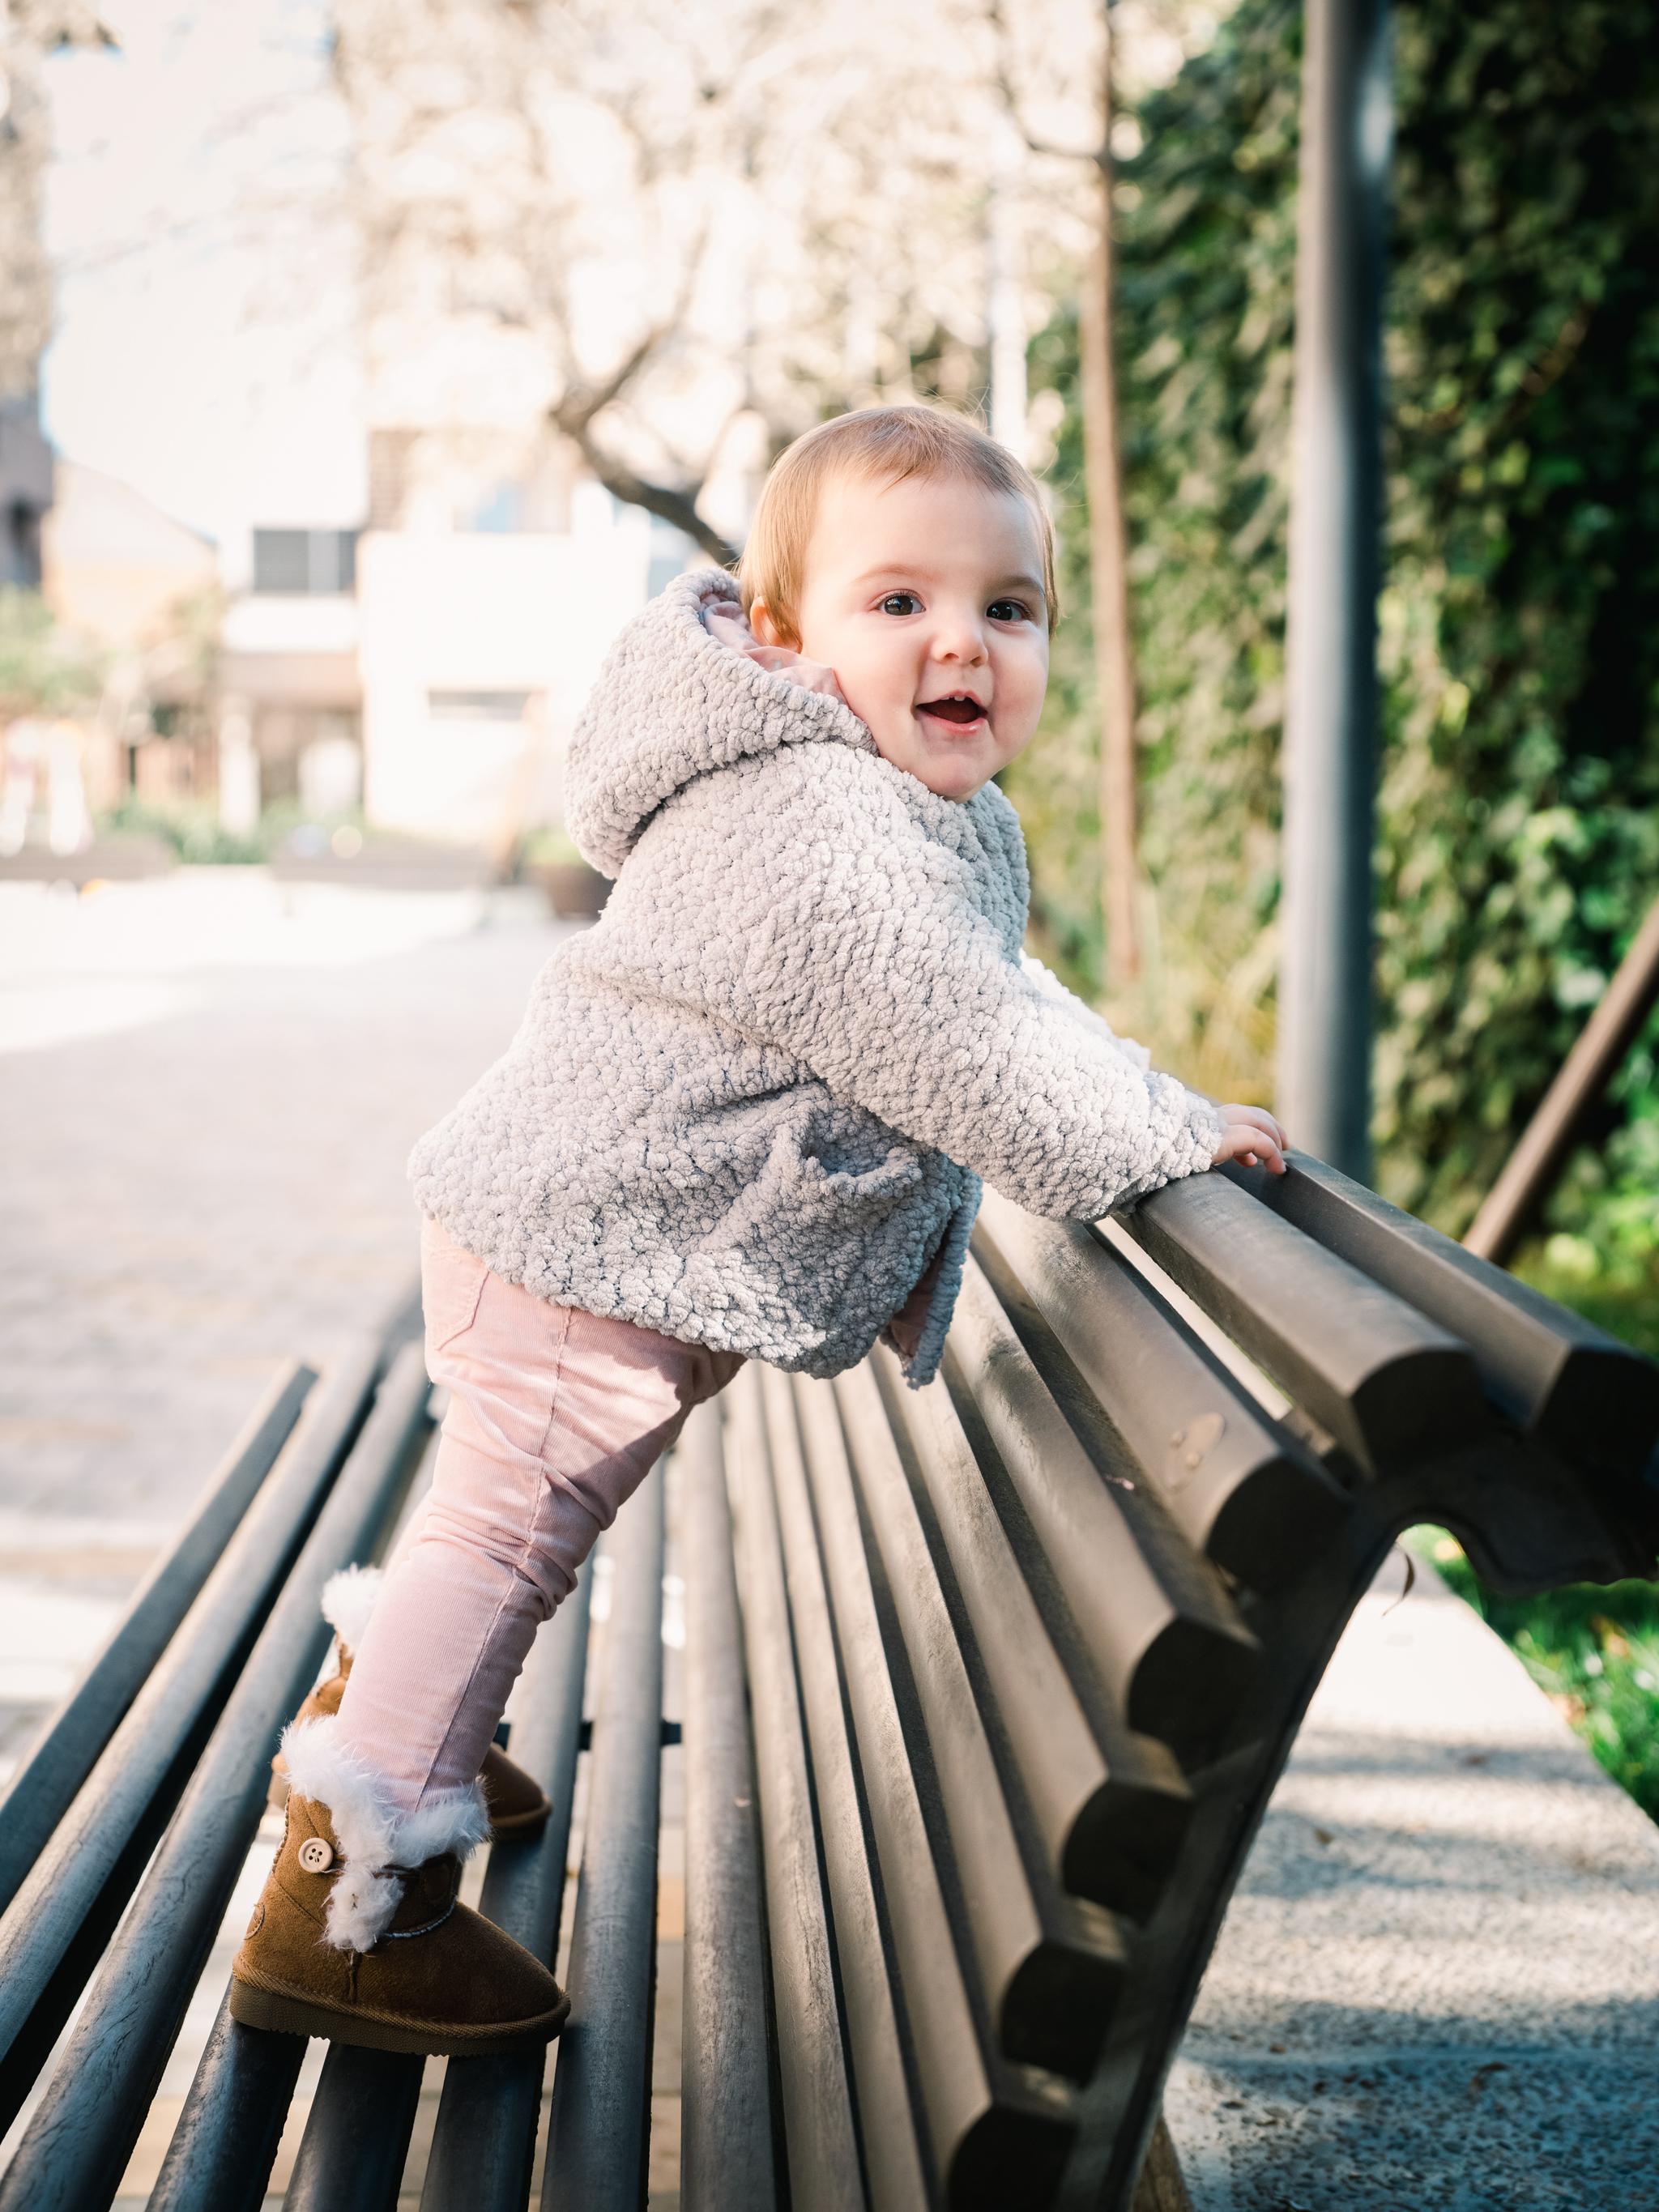 fotografia-infantil-familiar36.jpg